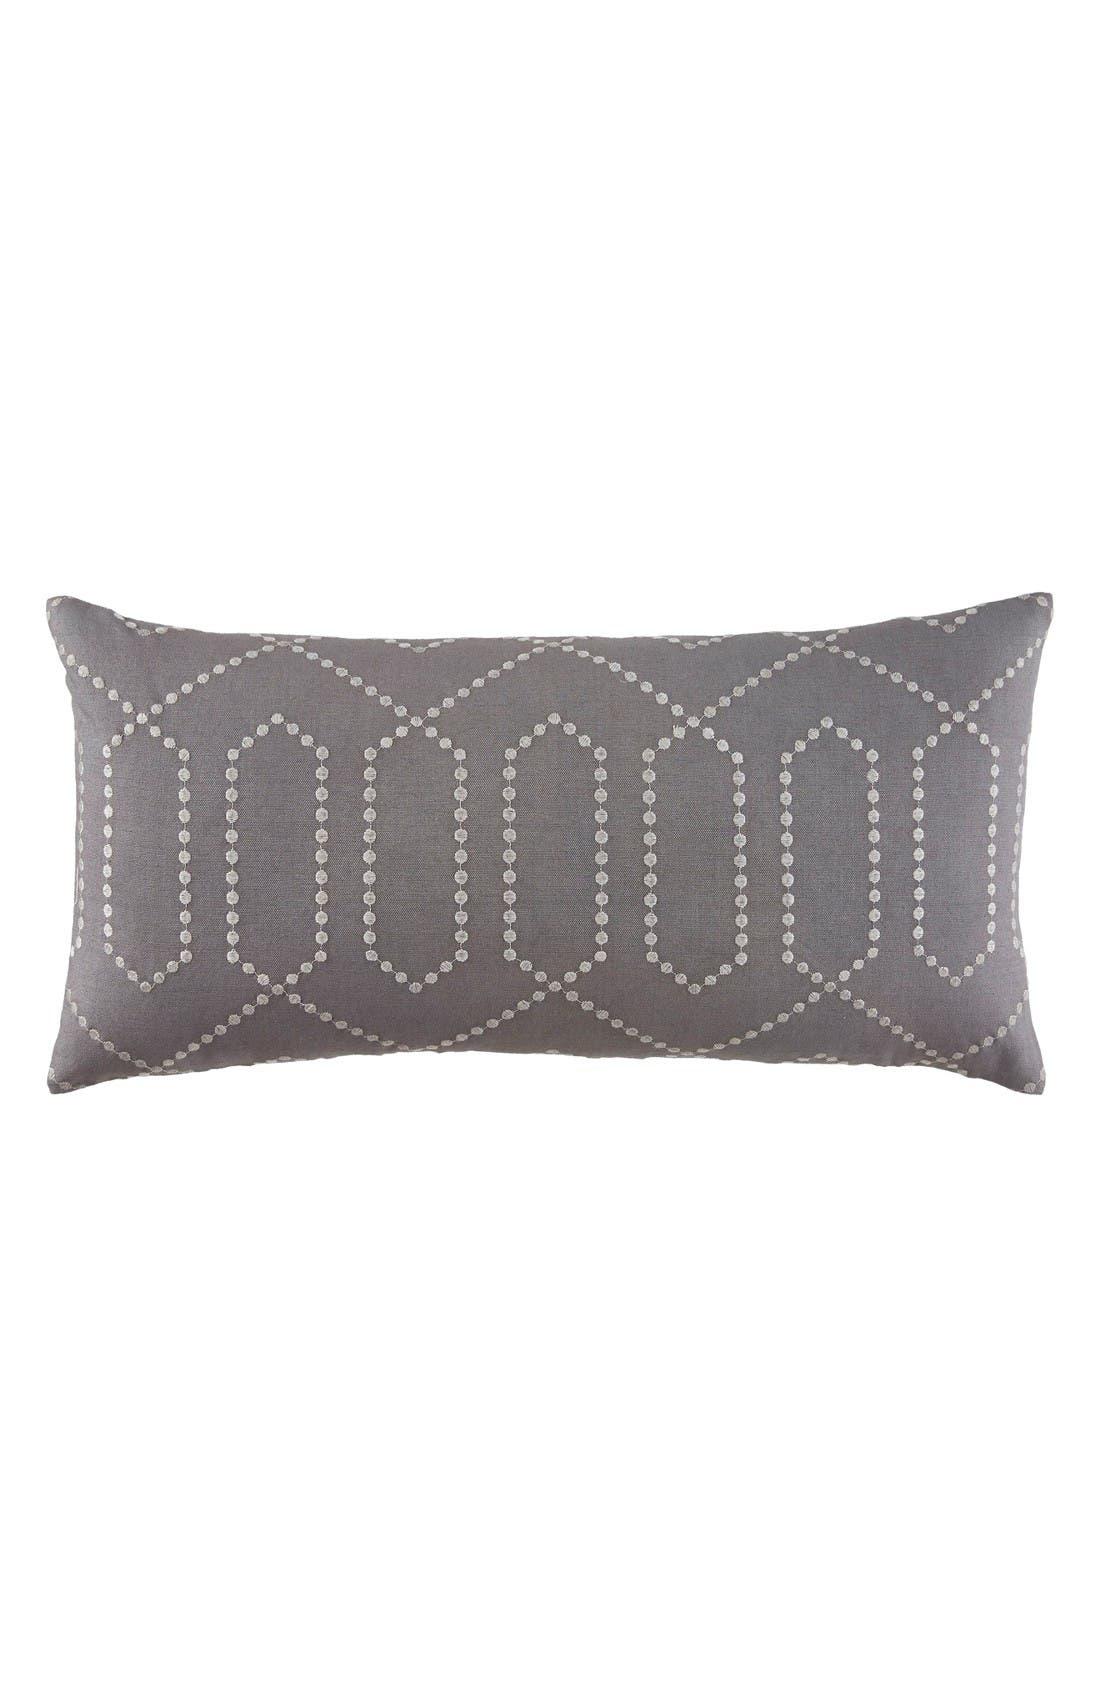 Decor Trellis Accent Pillow,                         Main,                         color, Grey